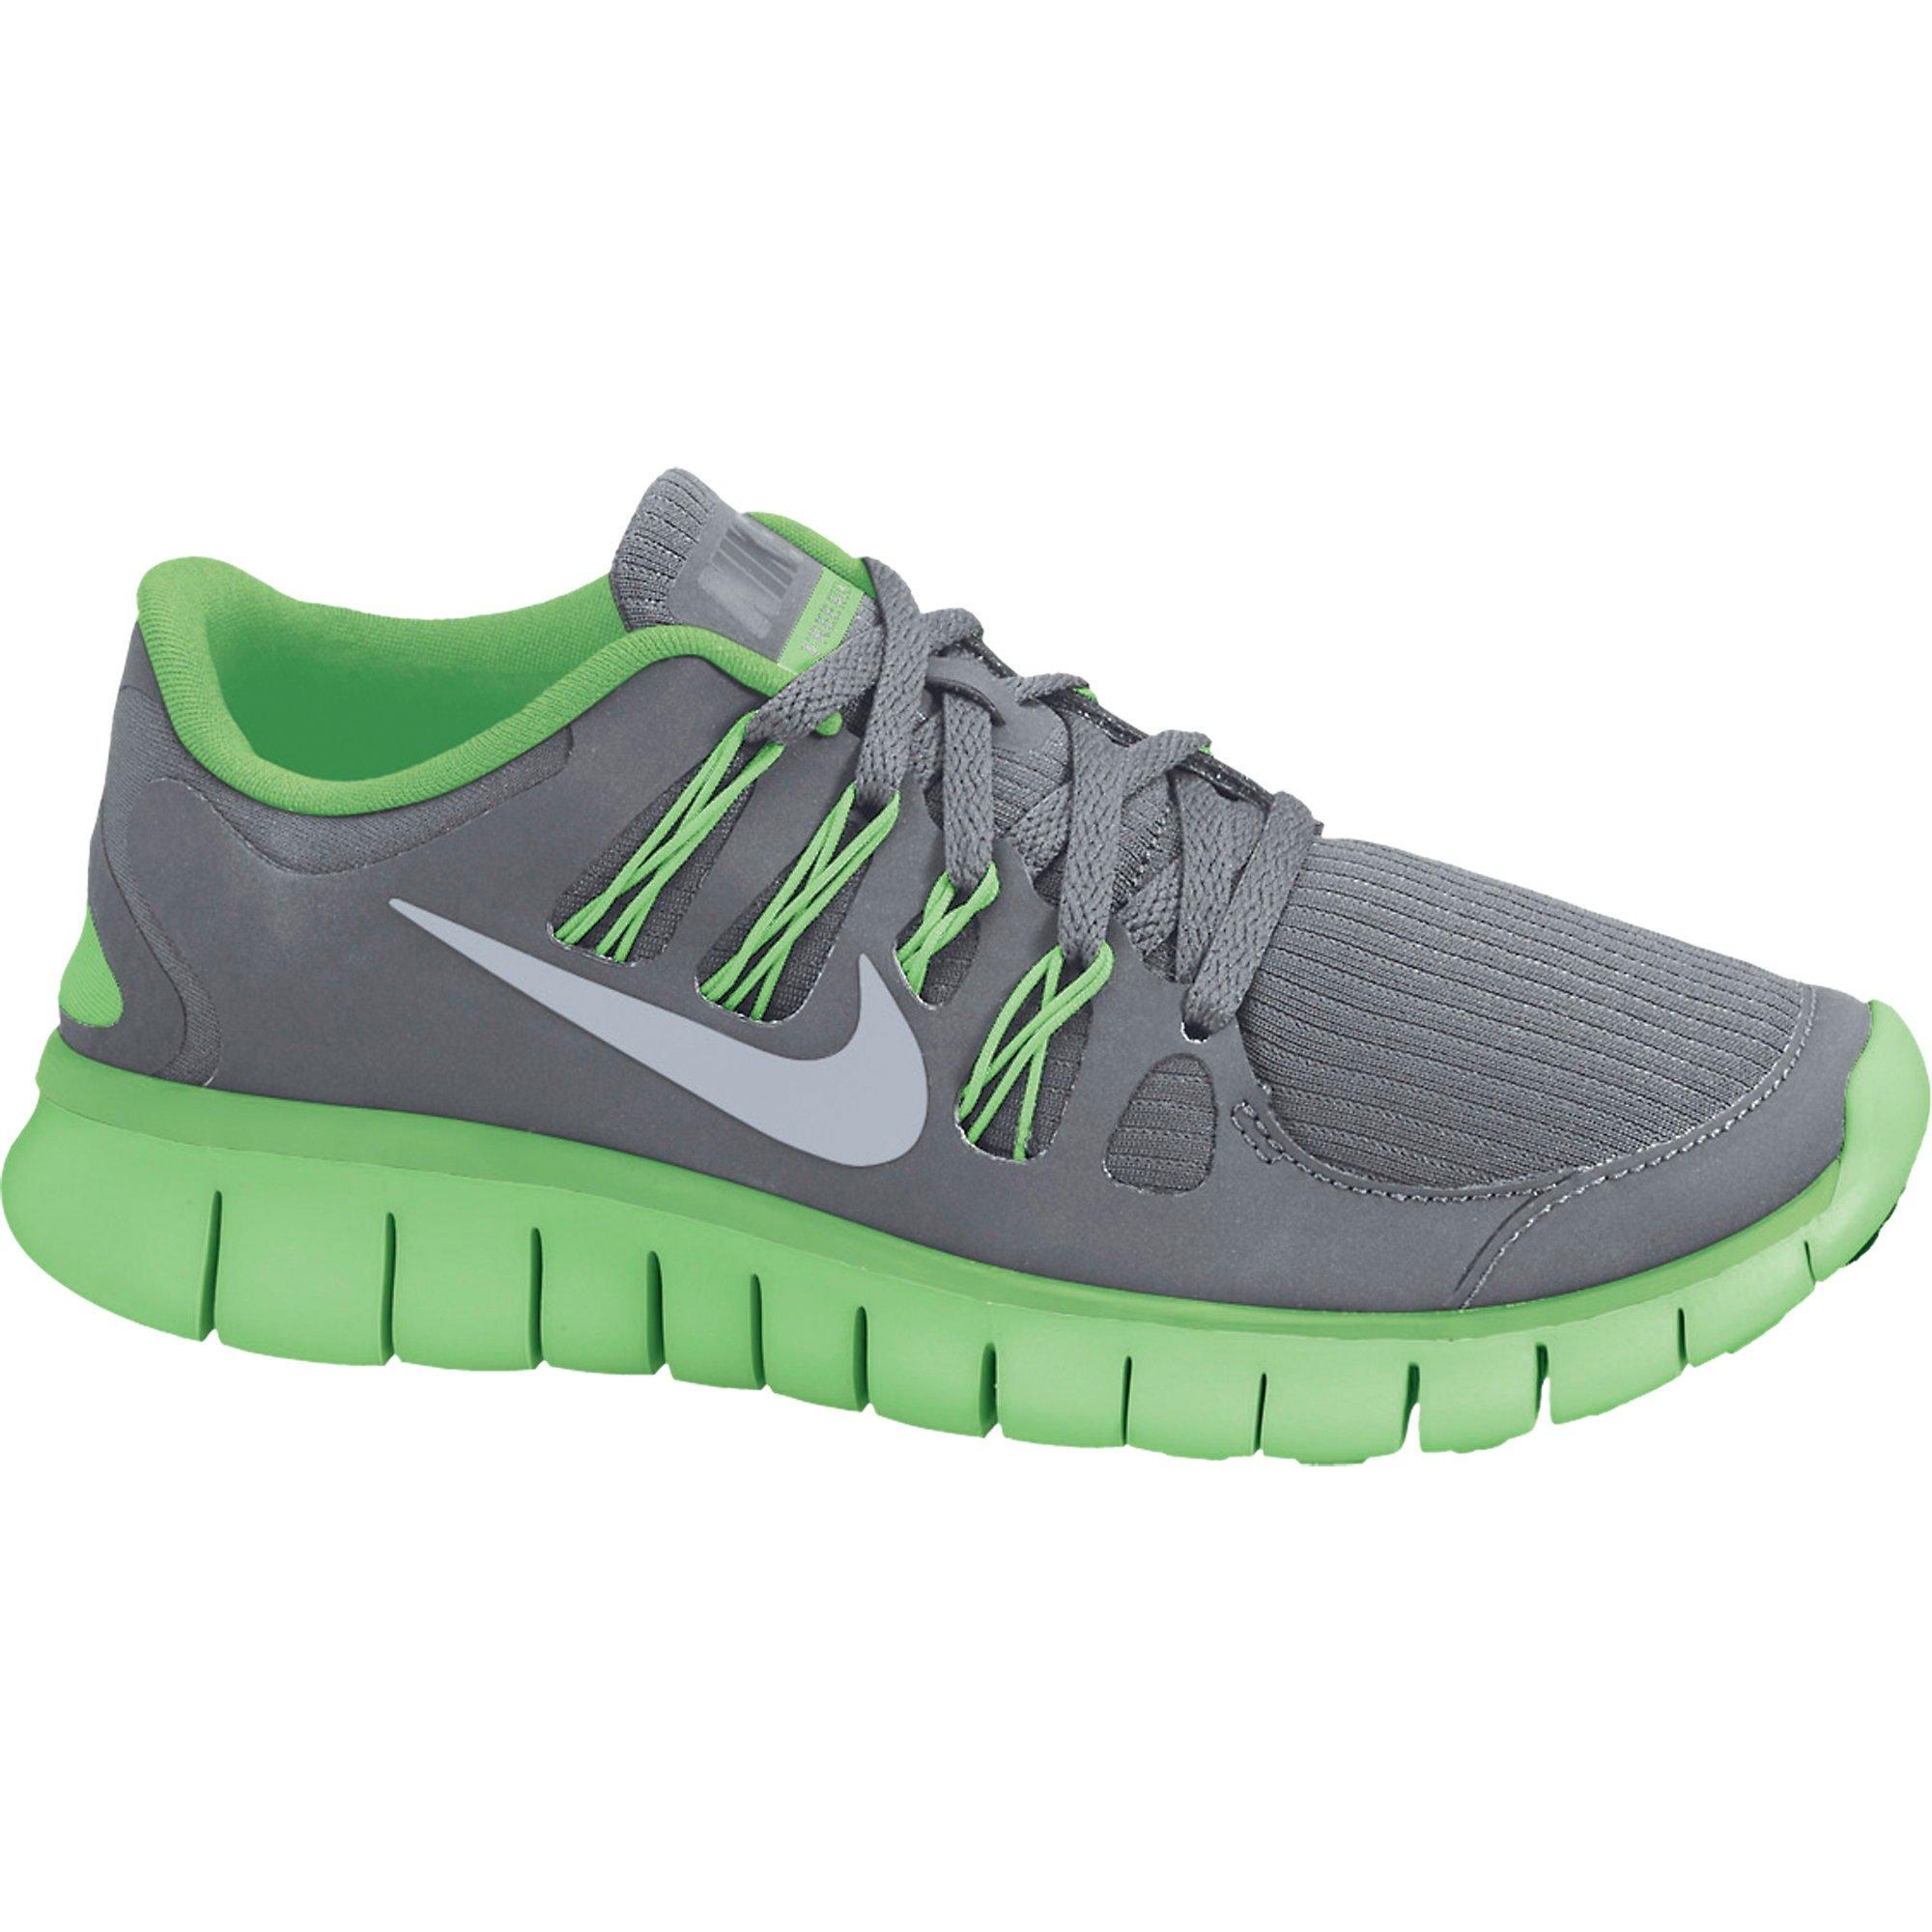 Billede af Nike Free Run Junior